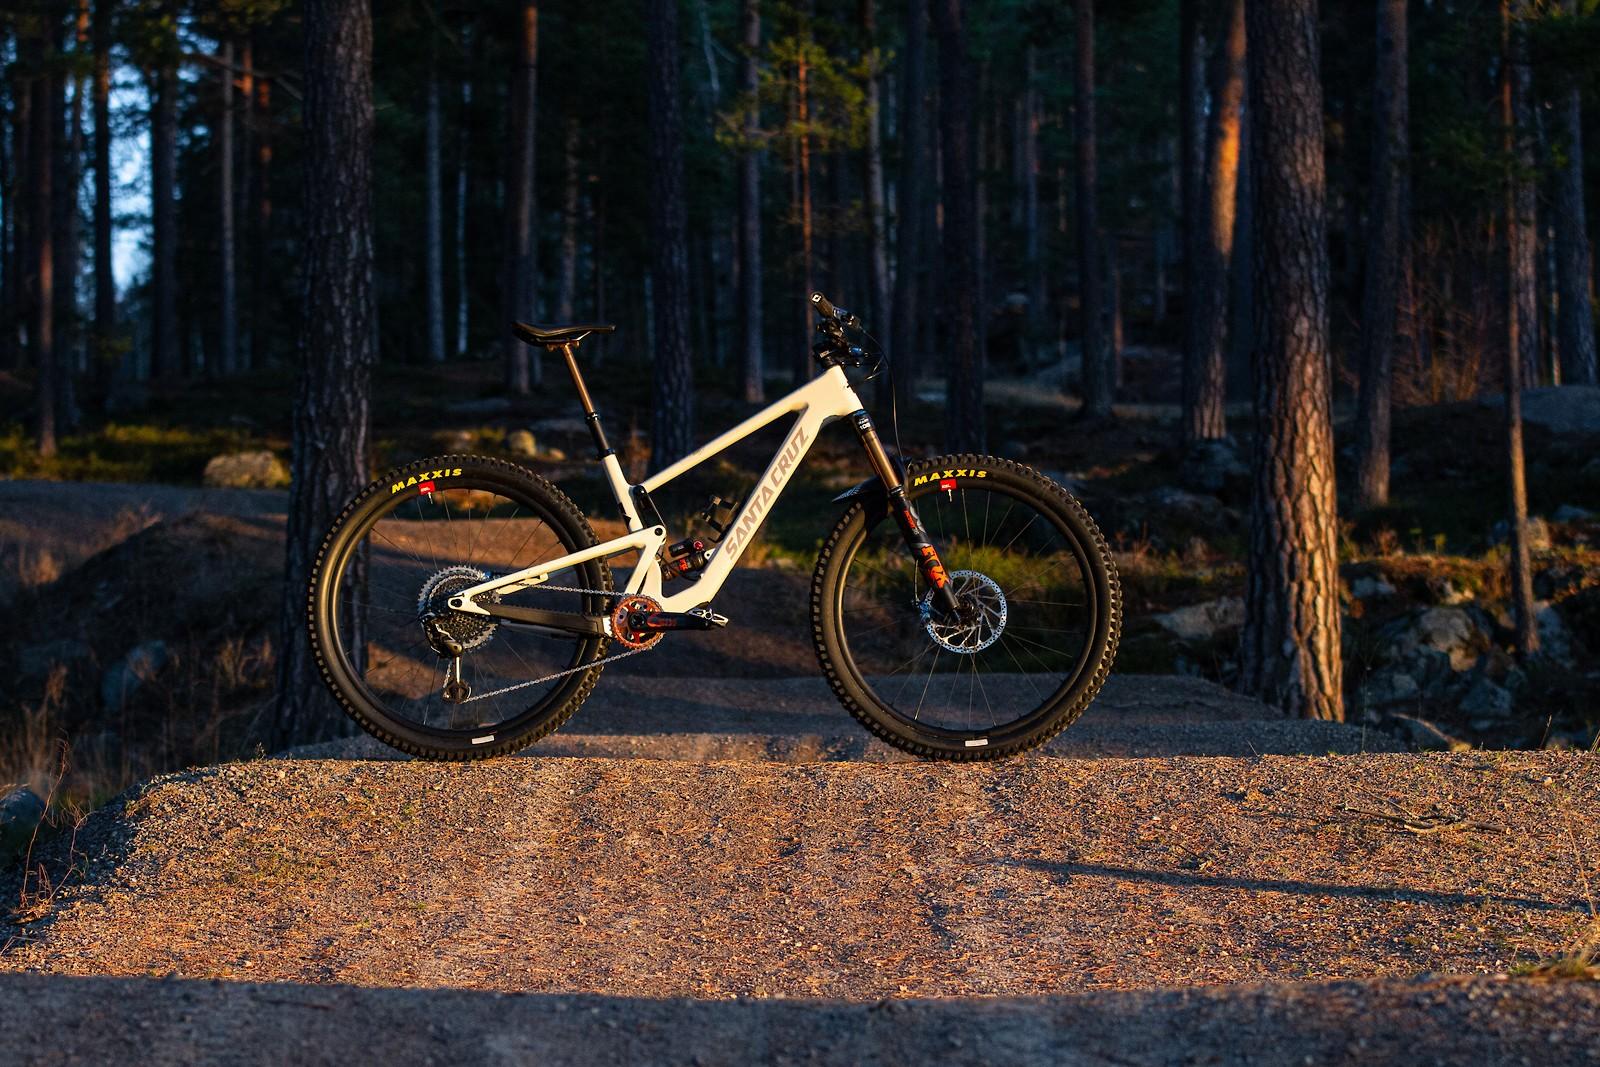 Santa Cruz Tallboy CC - Vital Bike of the Day November 2020 - Mountain Biking Pictures - Vital MTB